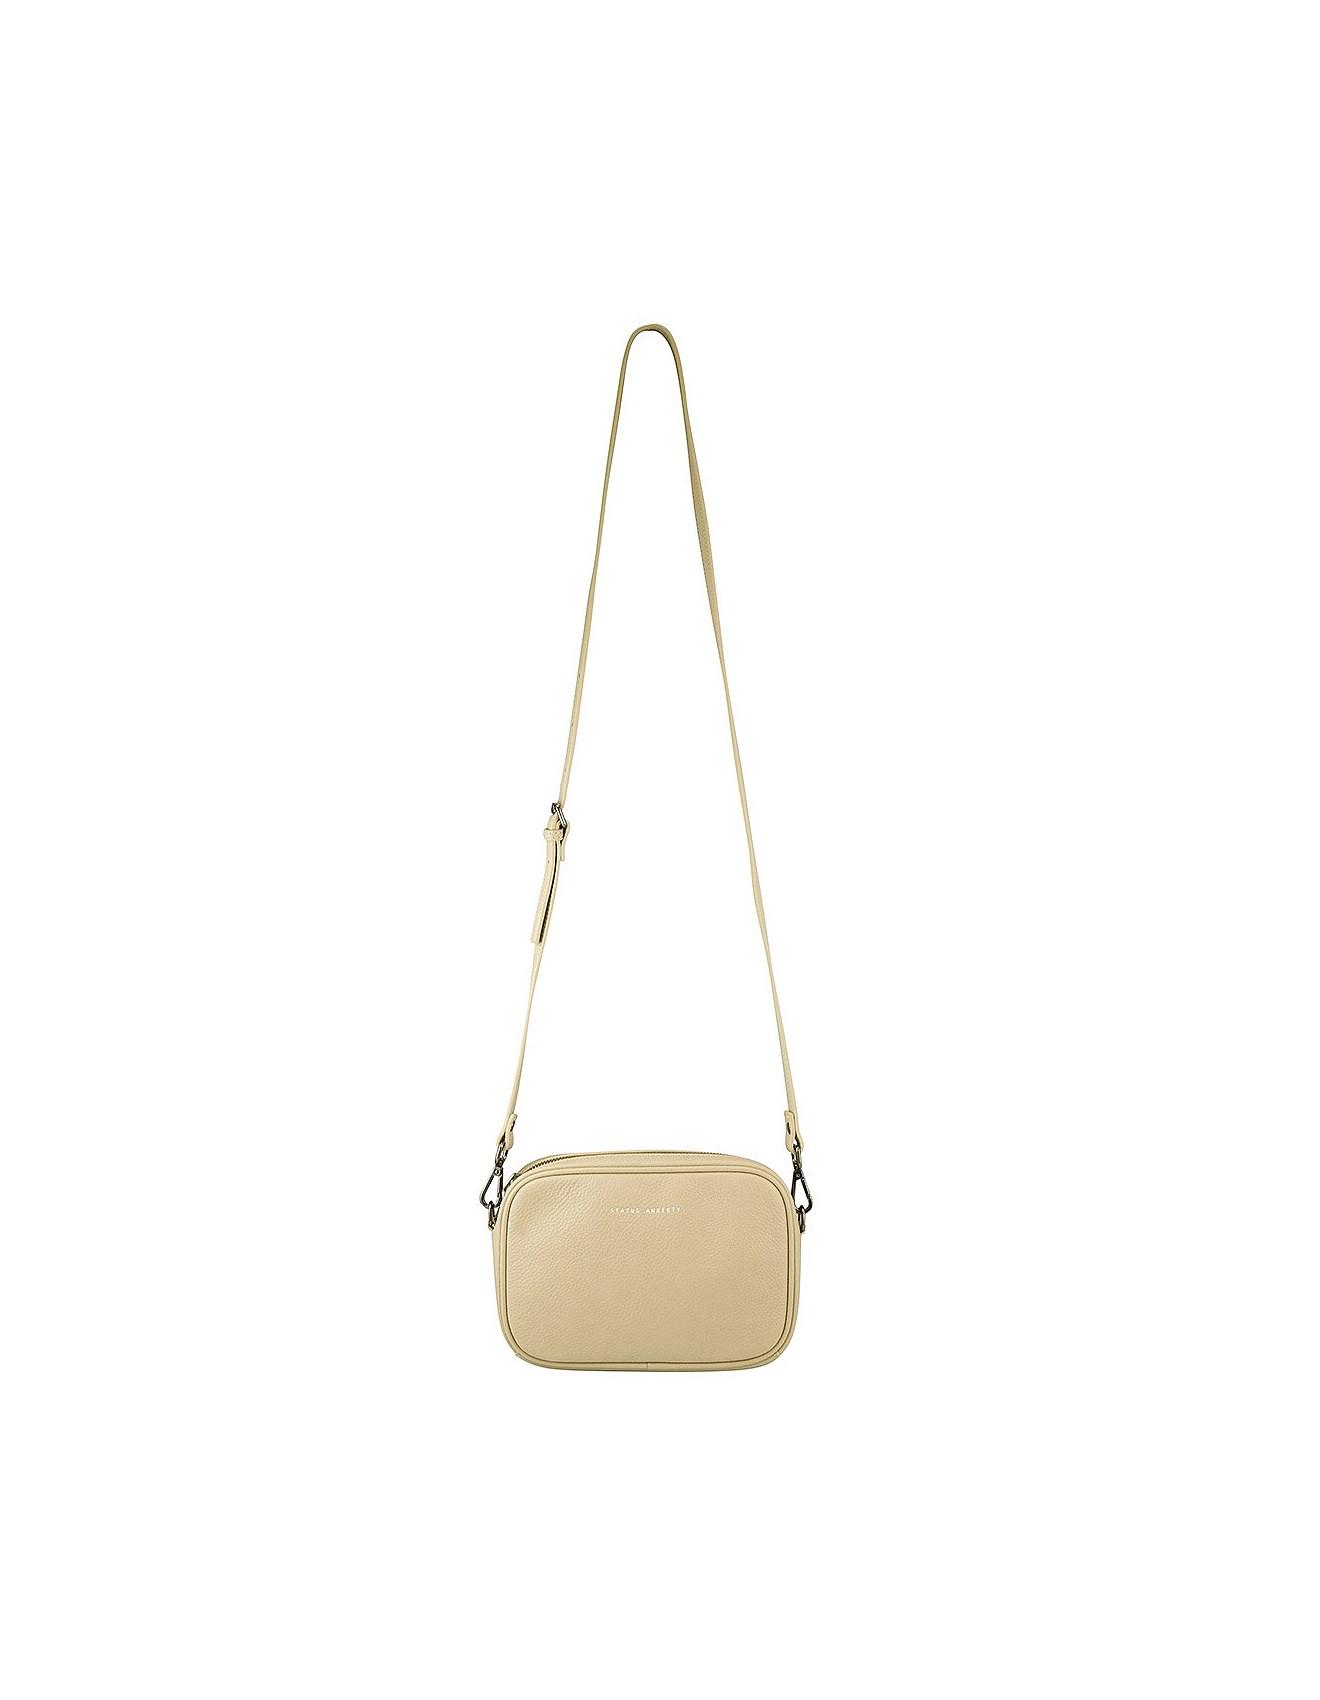 841c921a2a65 Plunder Bag